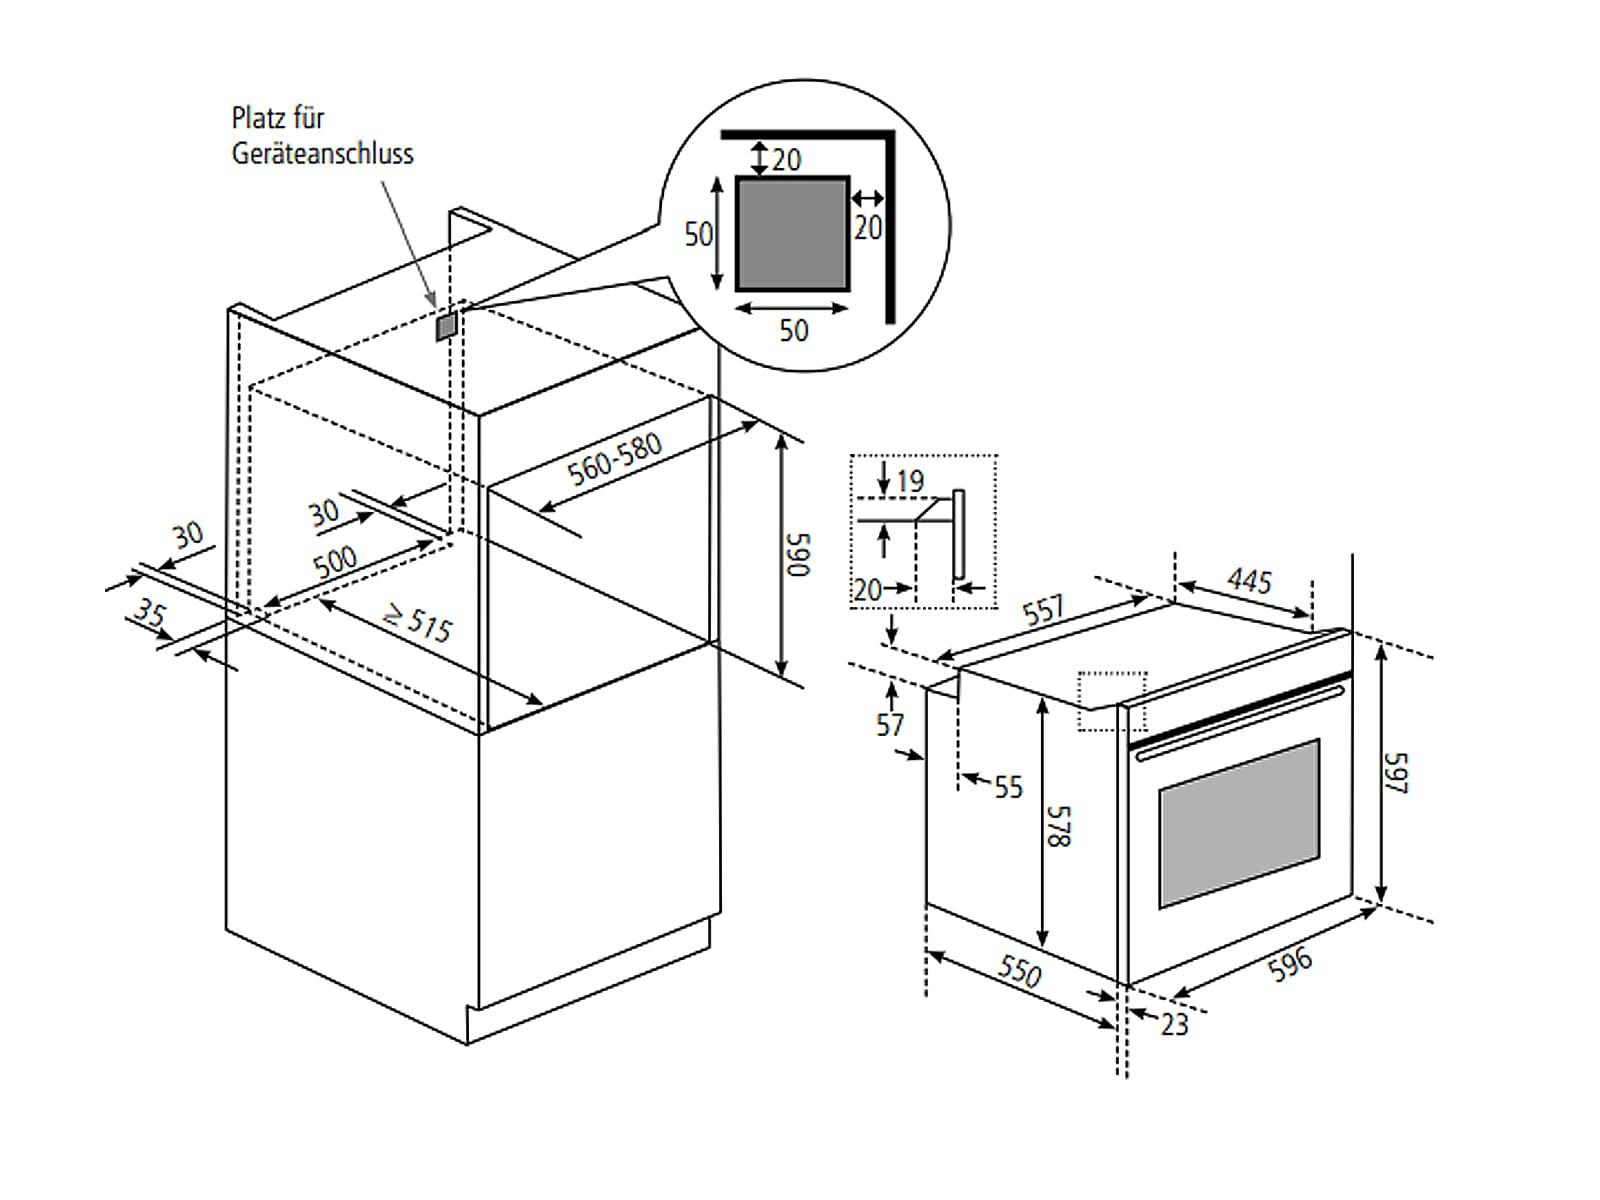 Oranier Clever-Set 26 - 9905 26 Backofen EBS 9872 + Kochfeldabzug KFL 2094 bc Umluft